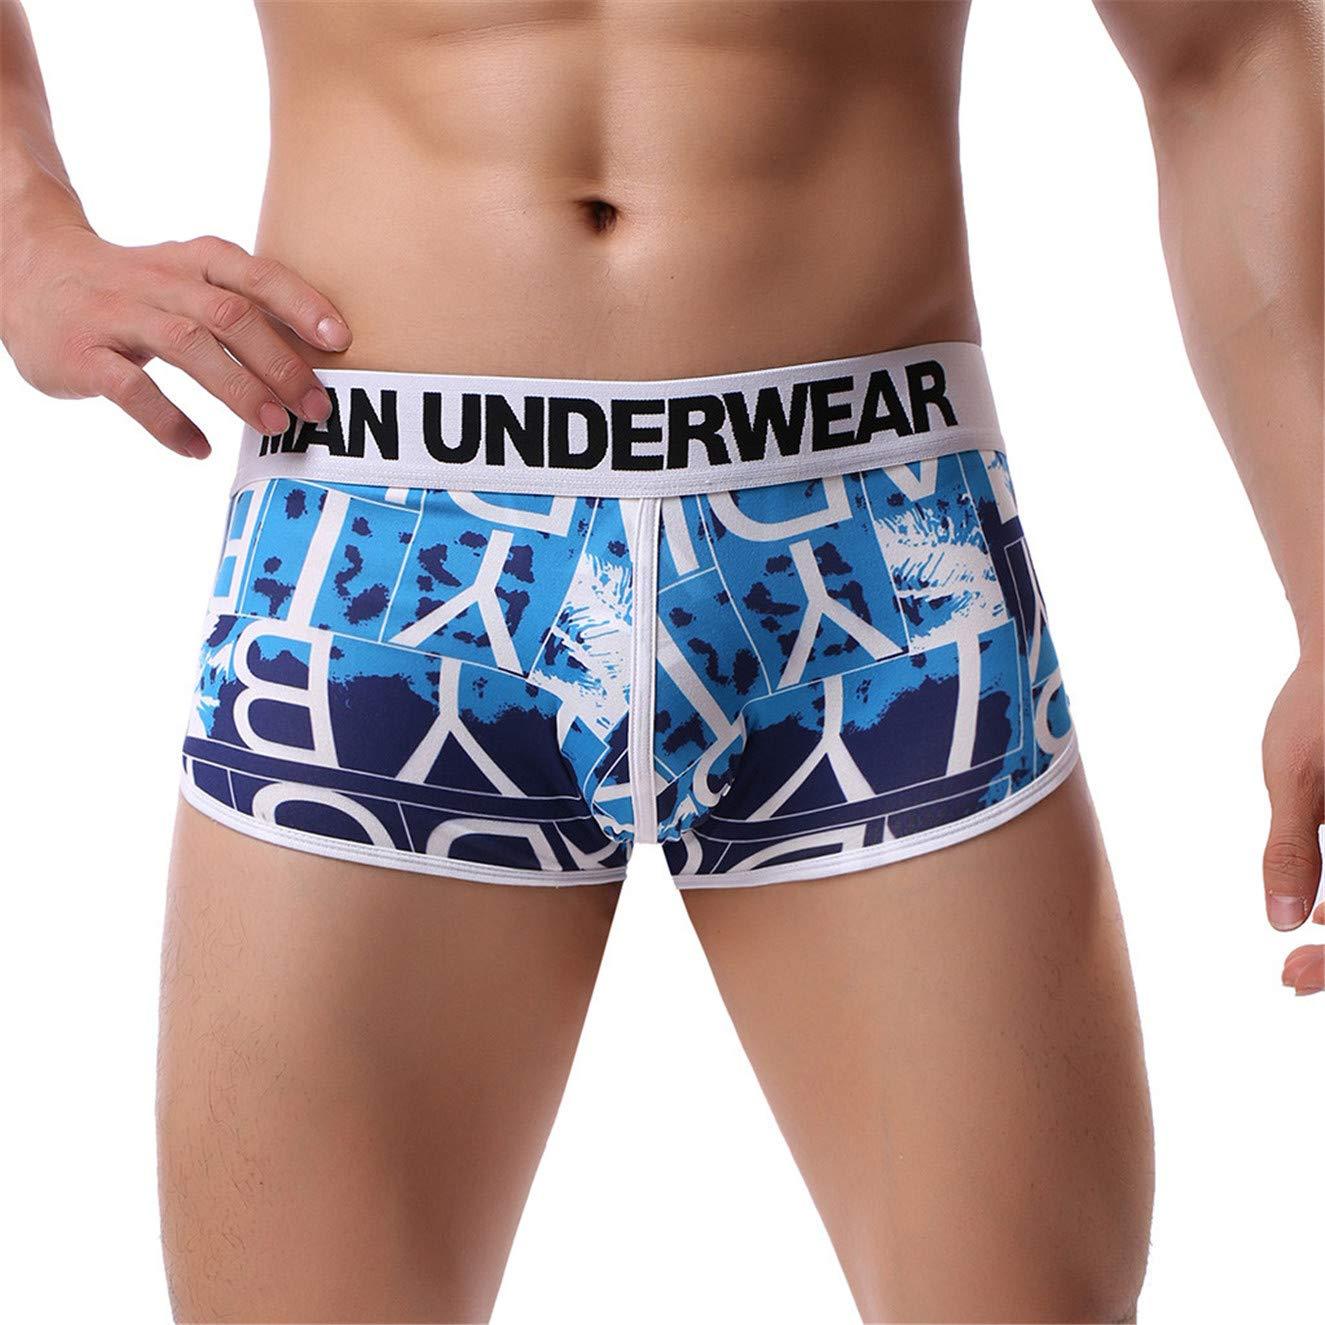 TIFENNY 2019 New Men's Printing Soft Briefs Fashion Underpants Knickers Shorts Sexy Underwear Blue